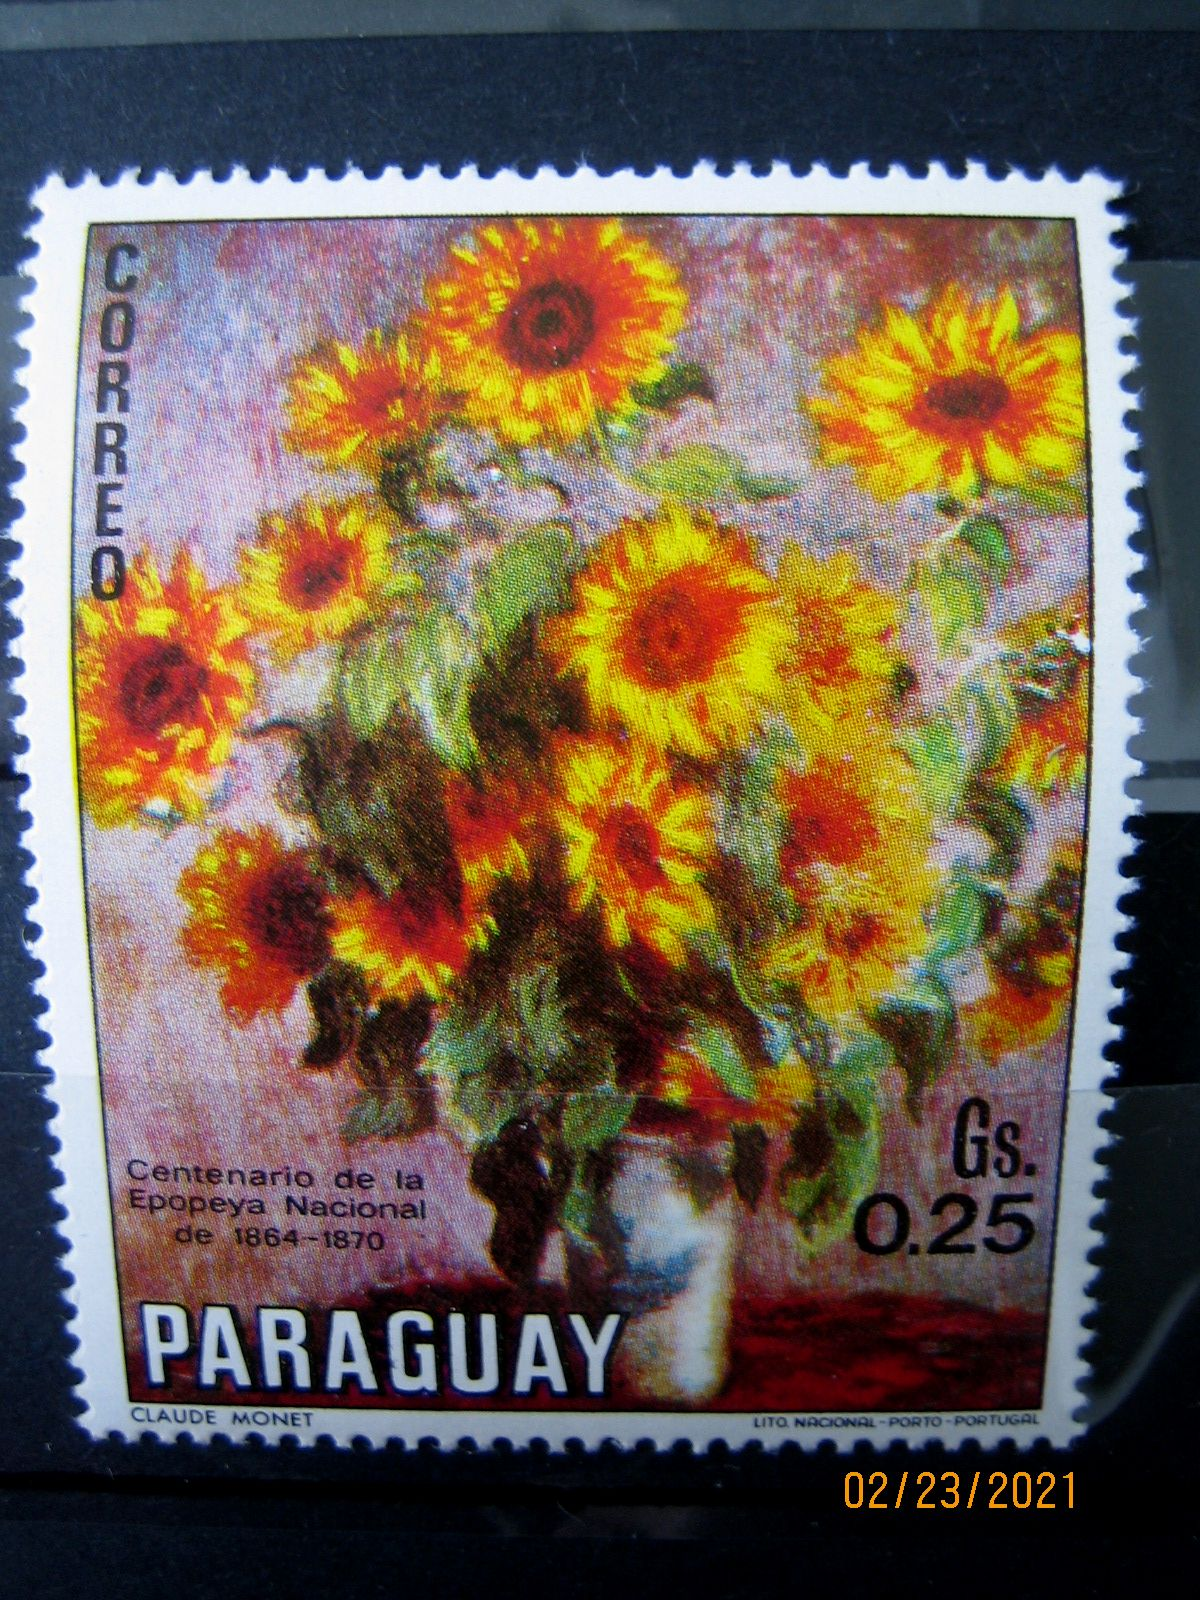 Марка Парагвай, 1970 г. Флора, 100-летие национального эпоса 1864-1870, на марке представлена Цветочная композиция; по Моне, Mi:PY 2095, Sn:PY 1299d, Yt:PY 1092, номинал — 0.25 Gs (гурани)